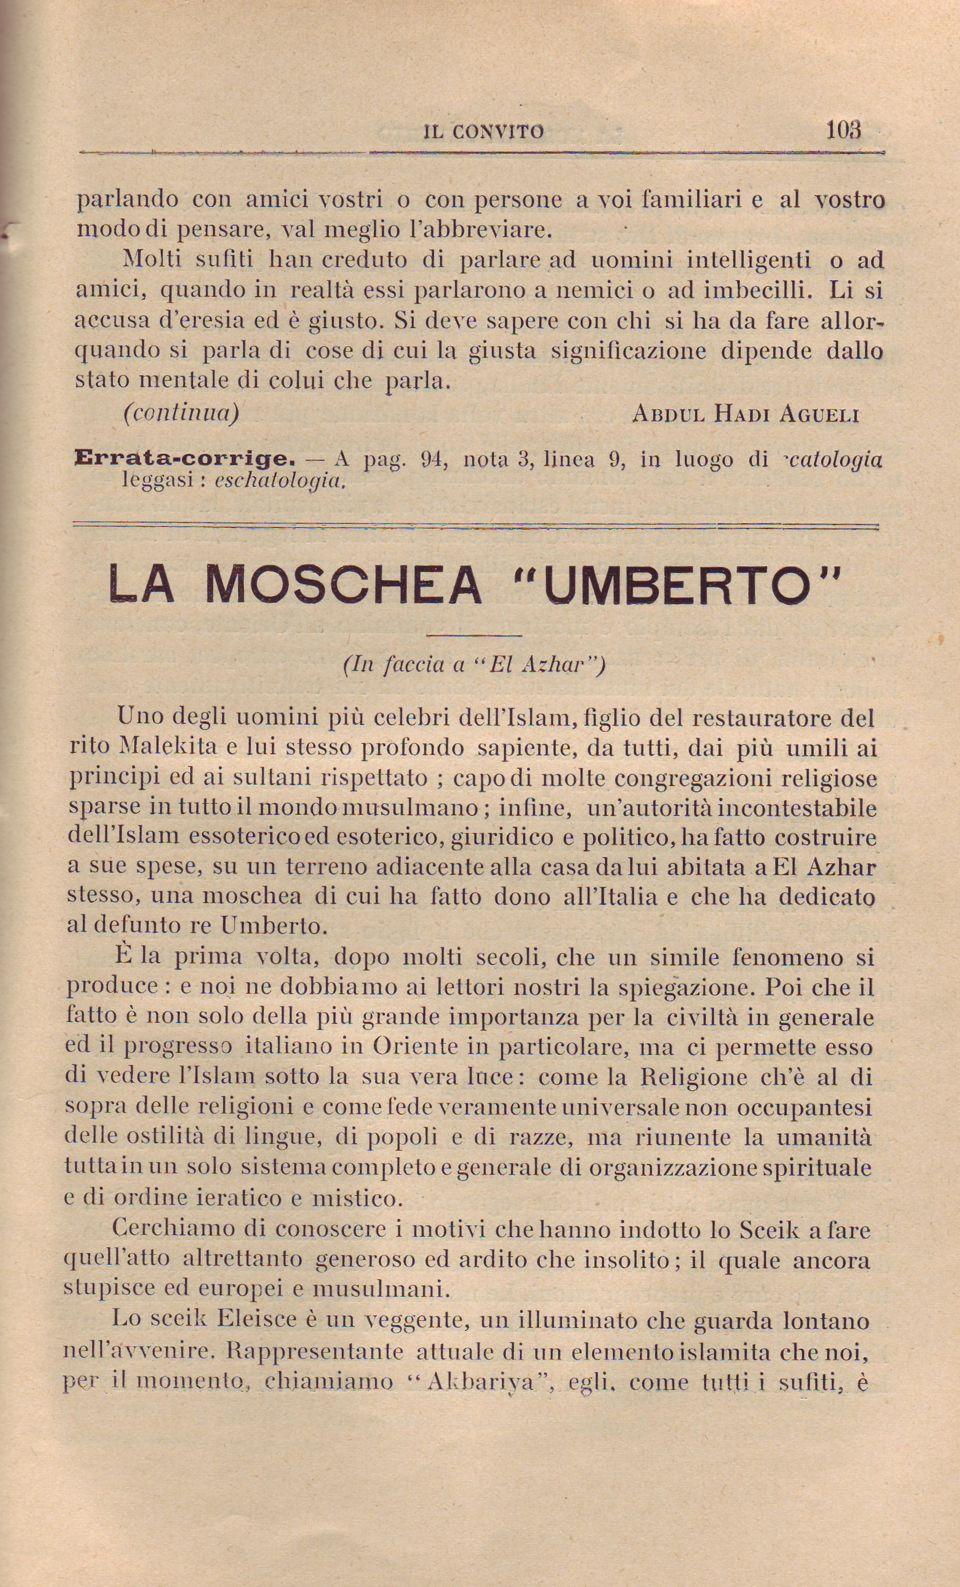 La Moschea Umberto 1. 103